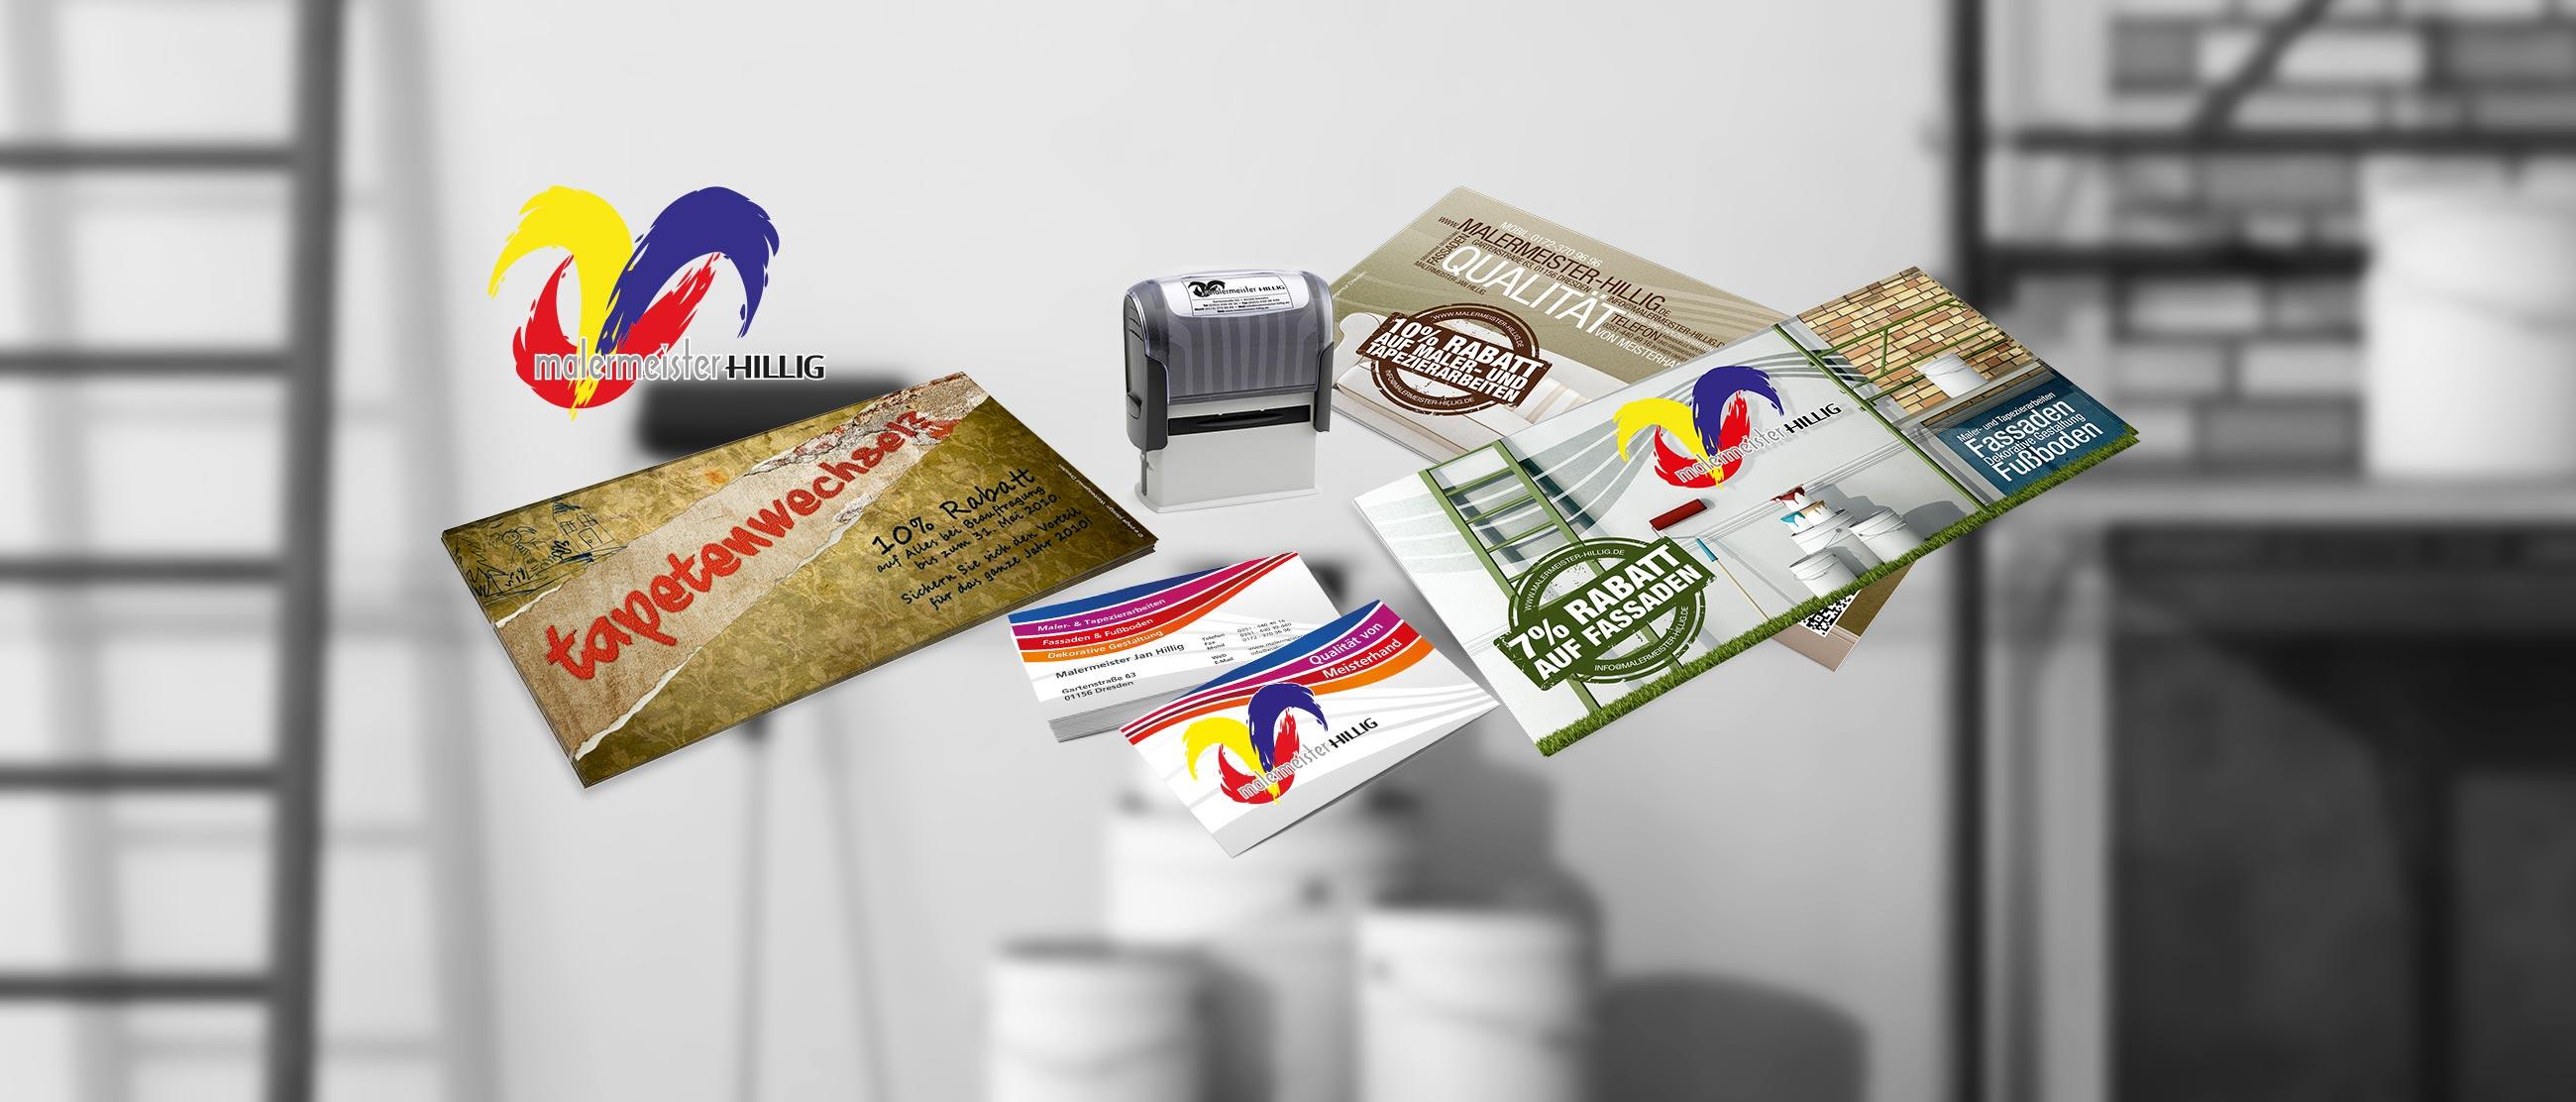 Malermeister Hillig: Corporate Designs (Logo, Website, Autobeklebung, Flyer, Visitenkarten, Stempel)